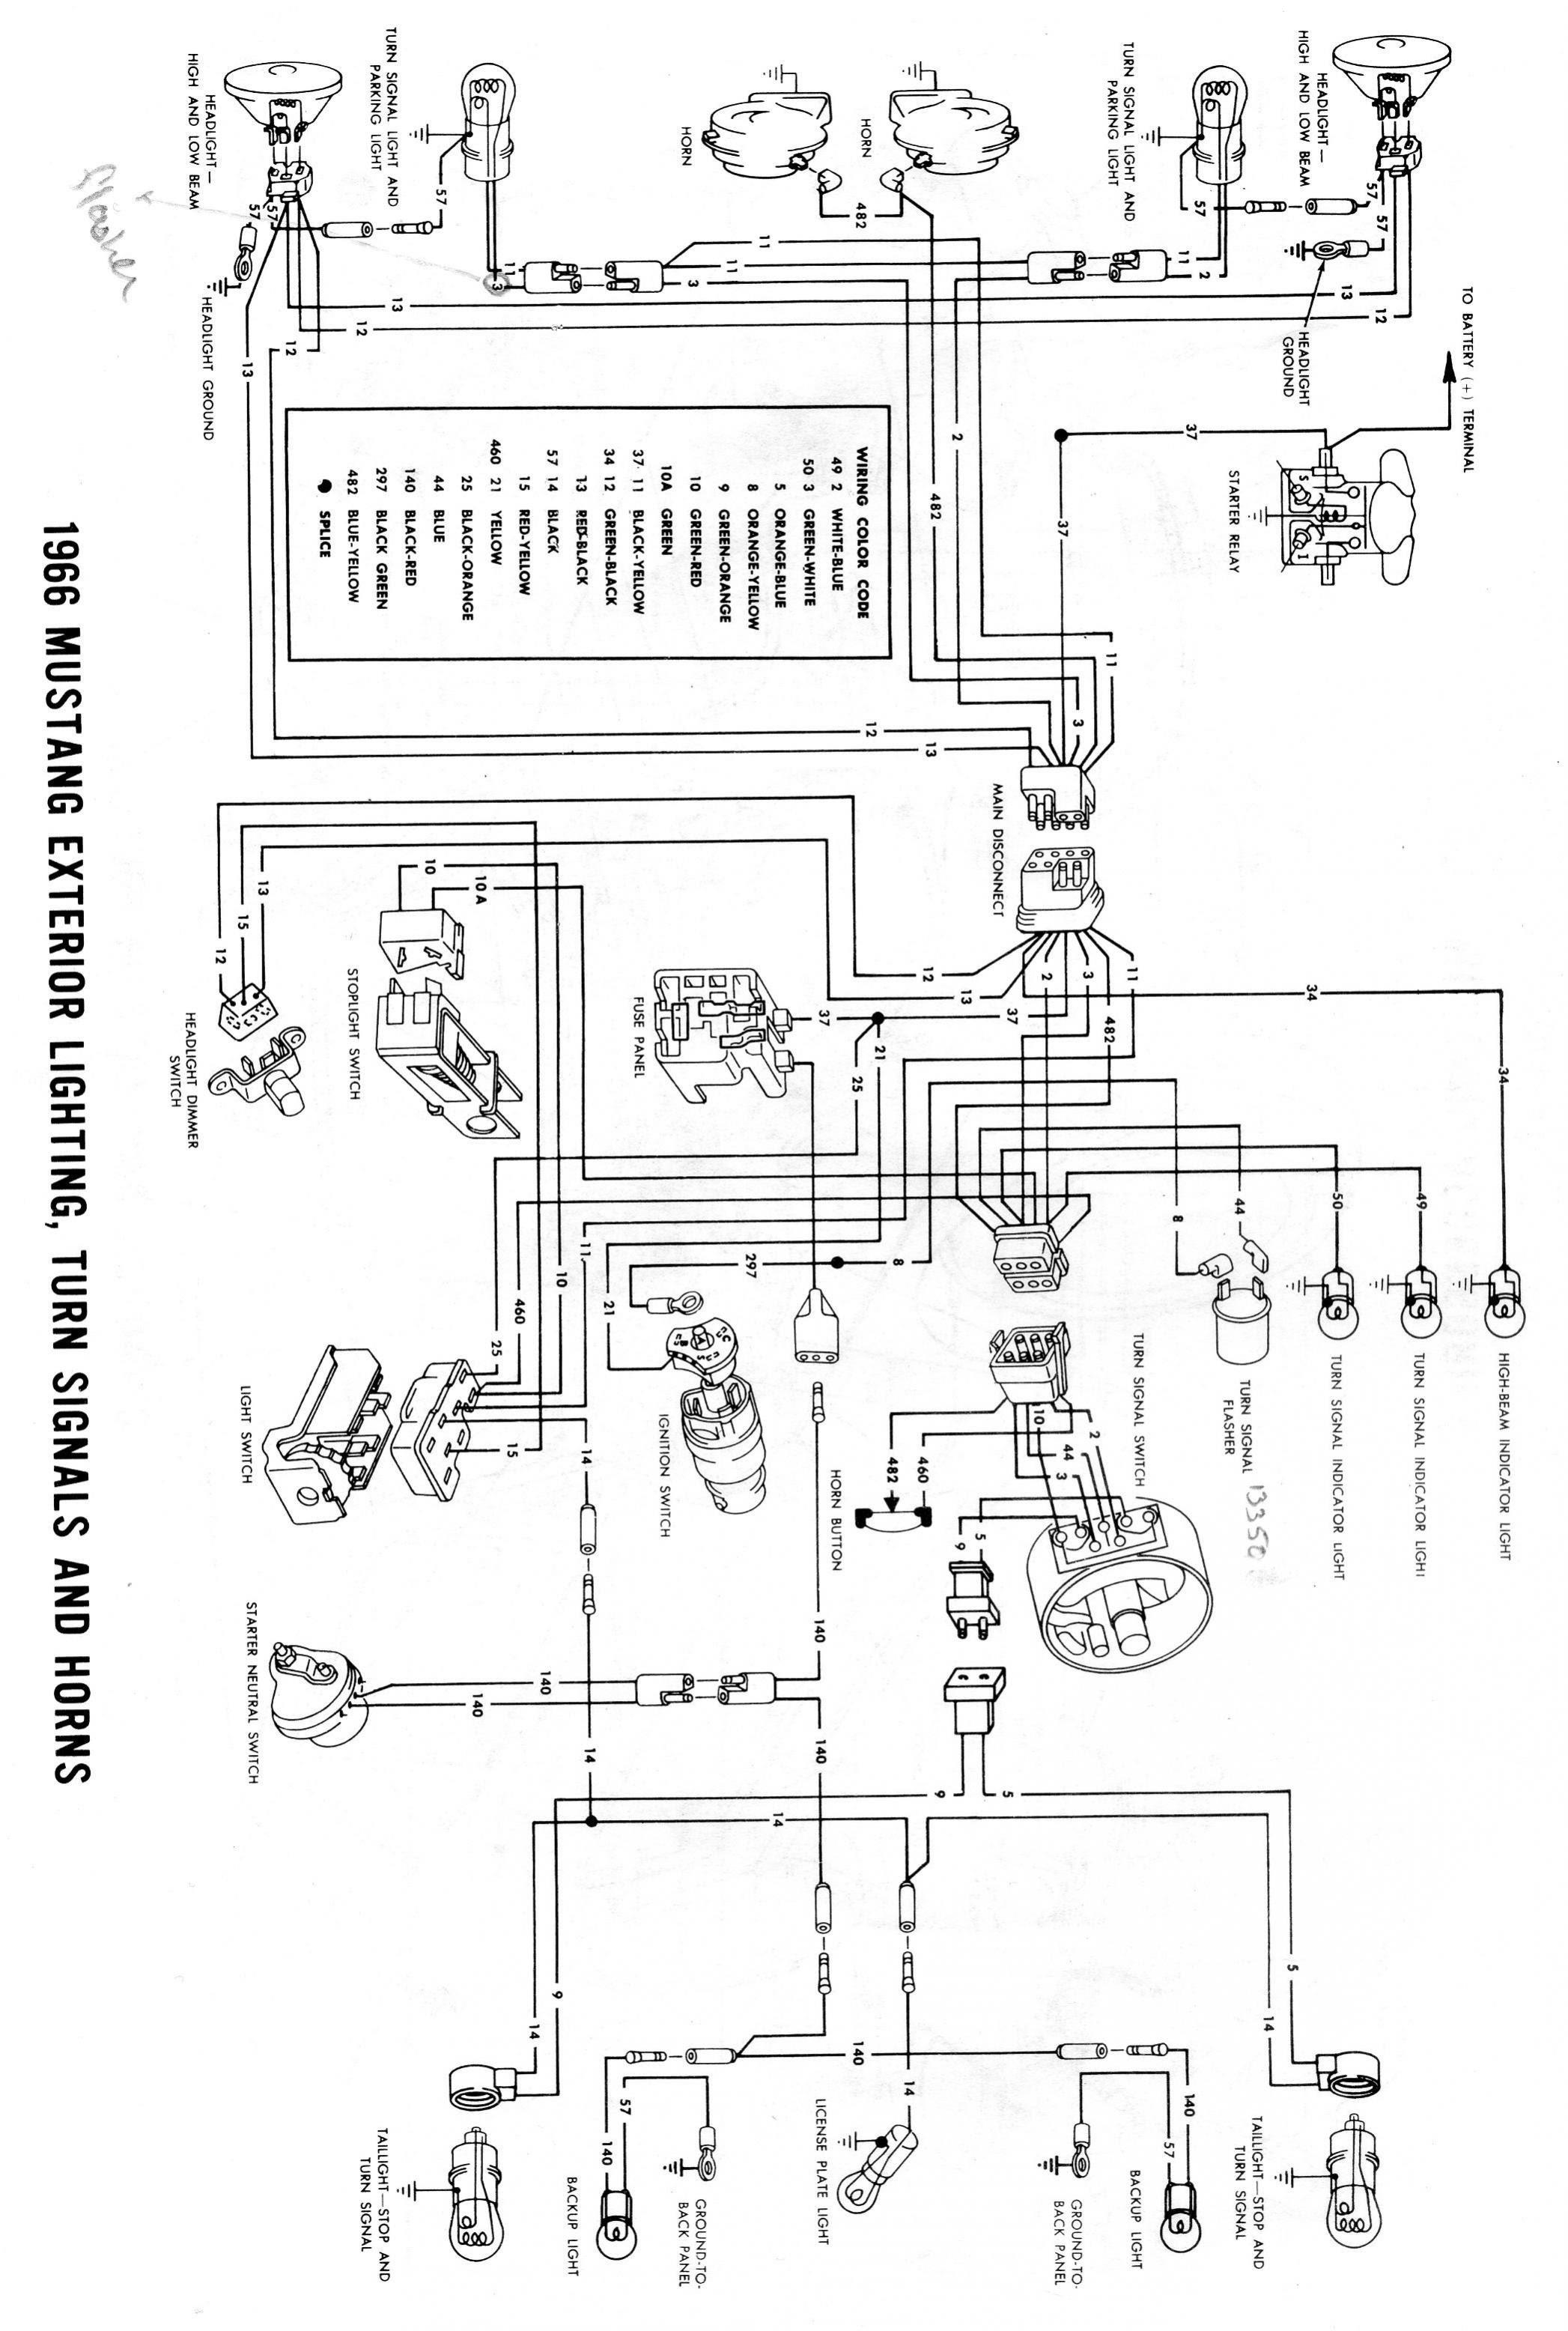 70 Mustang Horn Wiring Diagram Wiring Diagram Academic Academic Lastanzadeltempo It